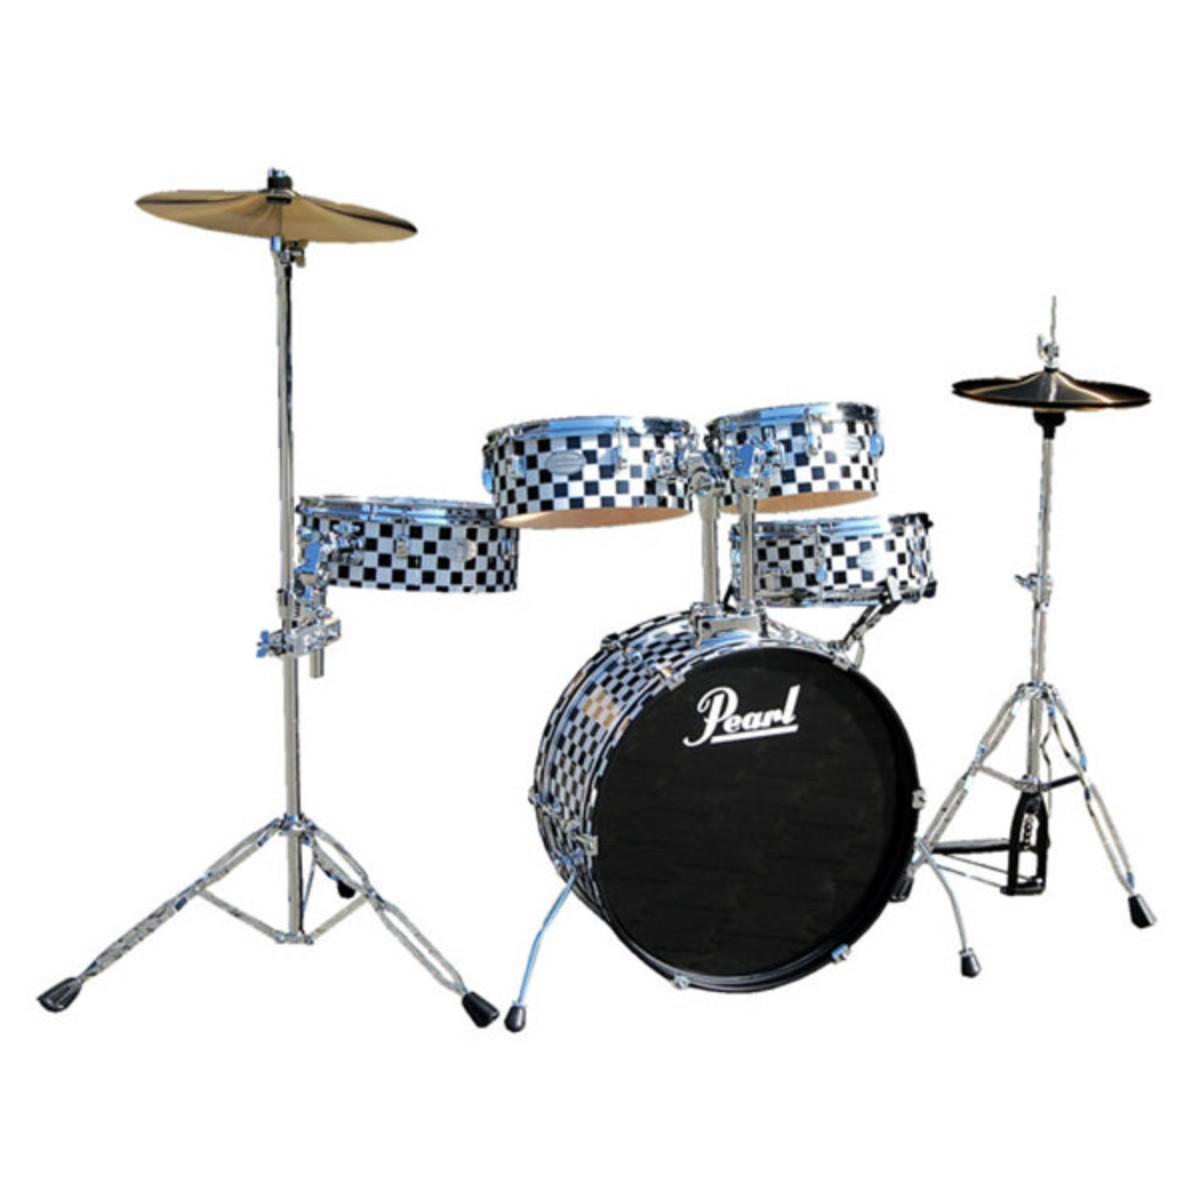 disc pearl rhythm traveler rt705hcc black and white checked kit ltd edition at. Black Bedroom Furniture Sets. Home Design Ideas